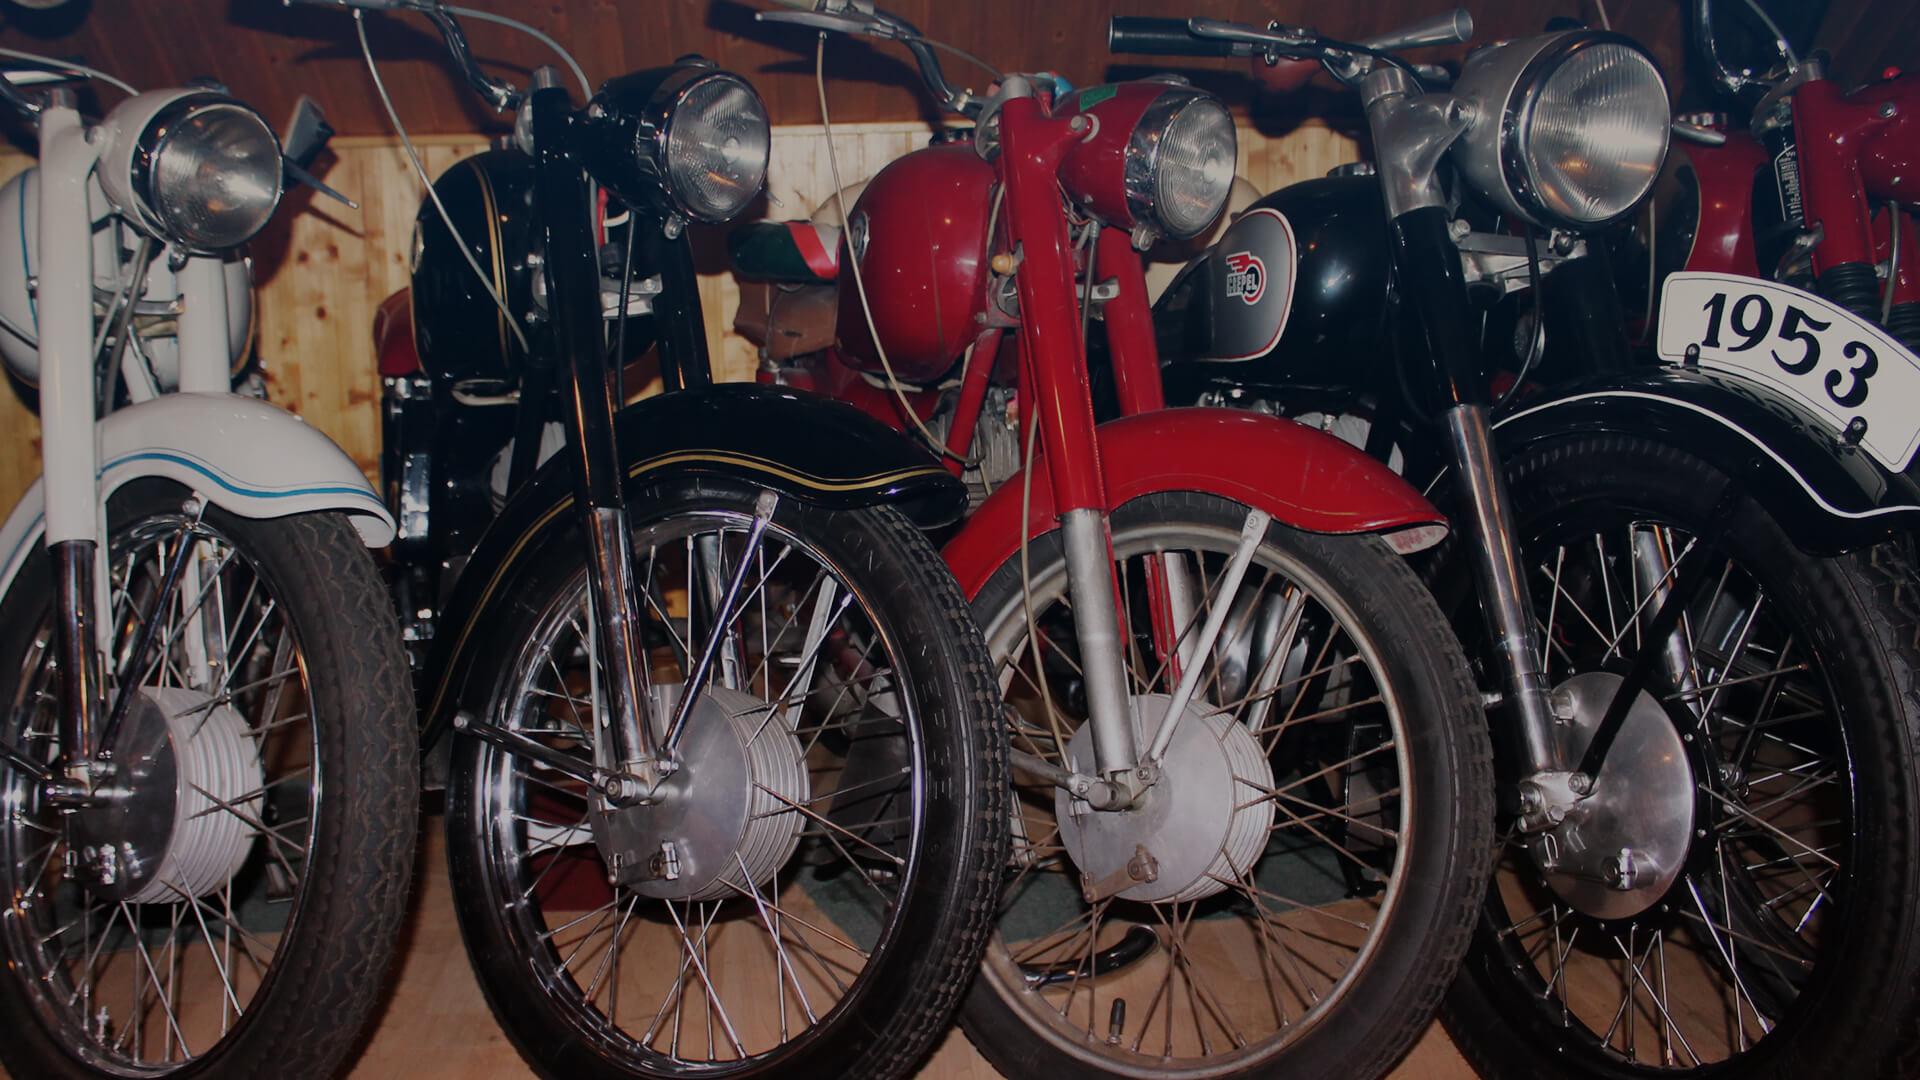 CSEPEL 125/50, 123 cm³, 1950